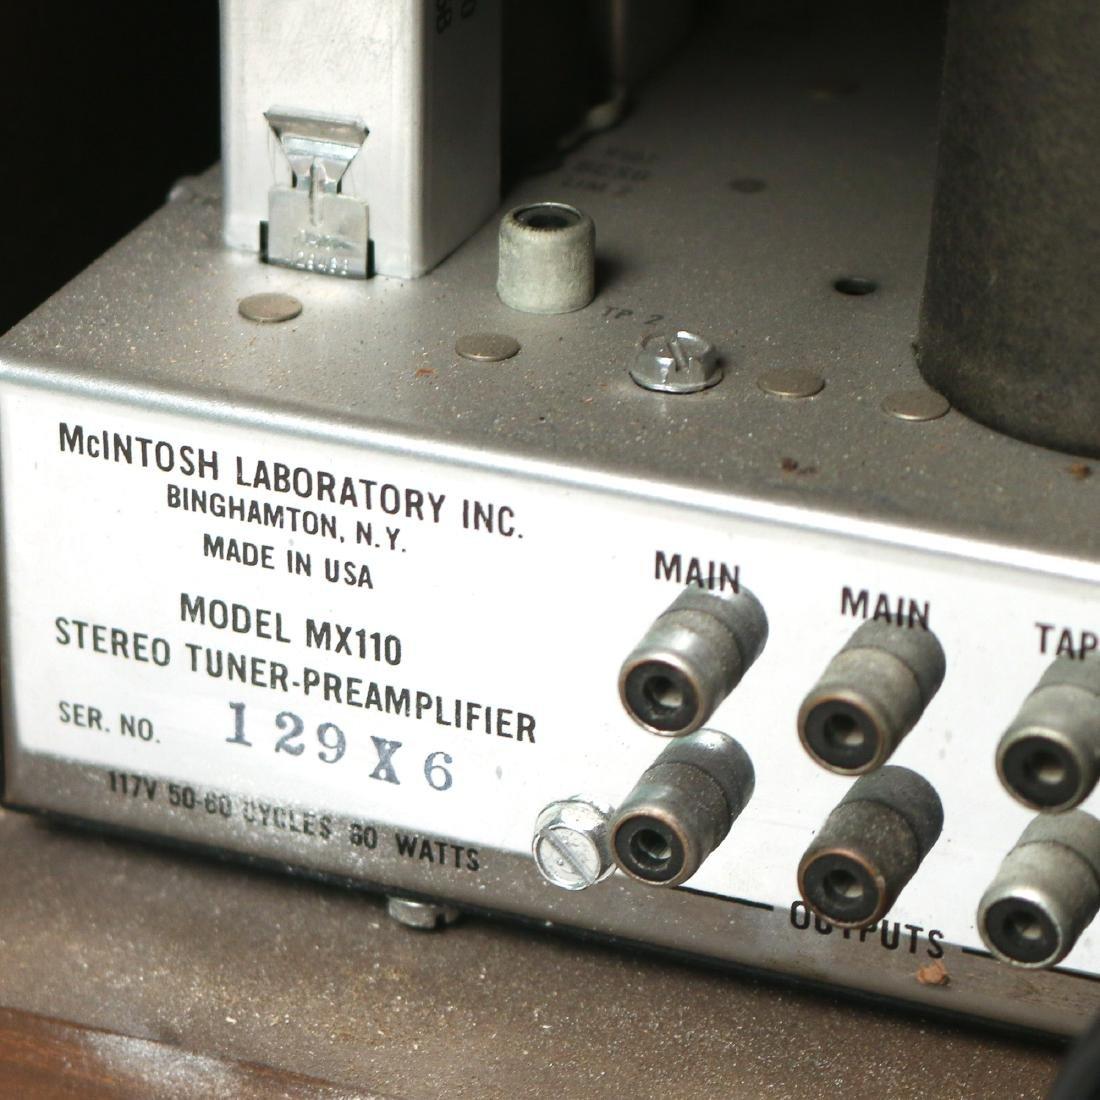 McINTOSH STEREO TUNER PRE-AMPLIFIER - 6